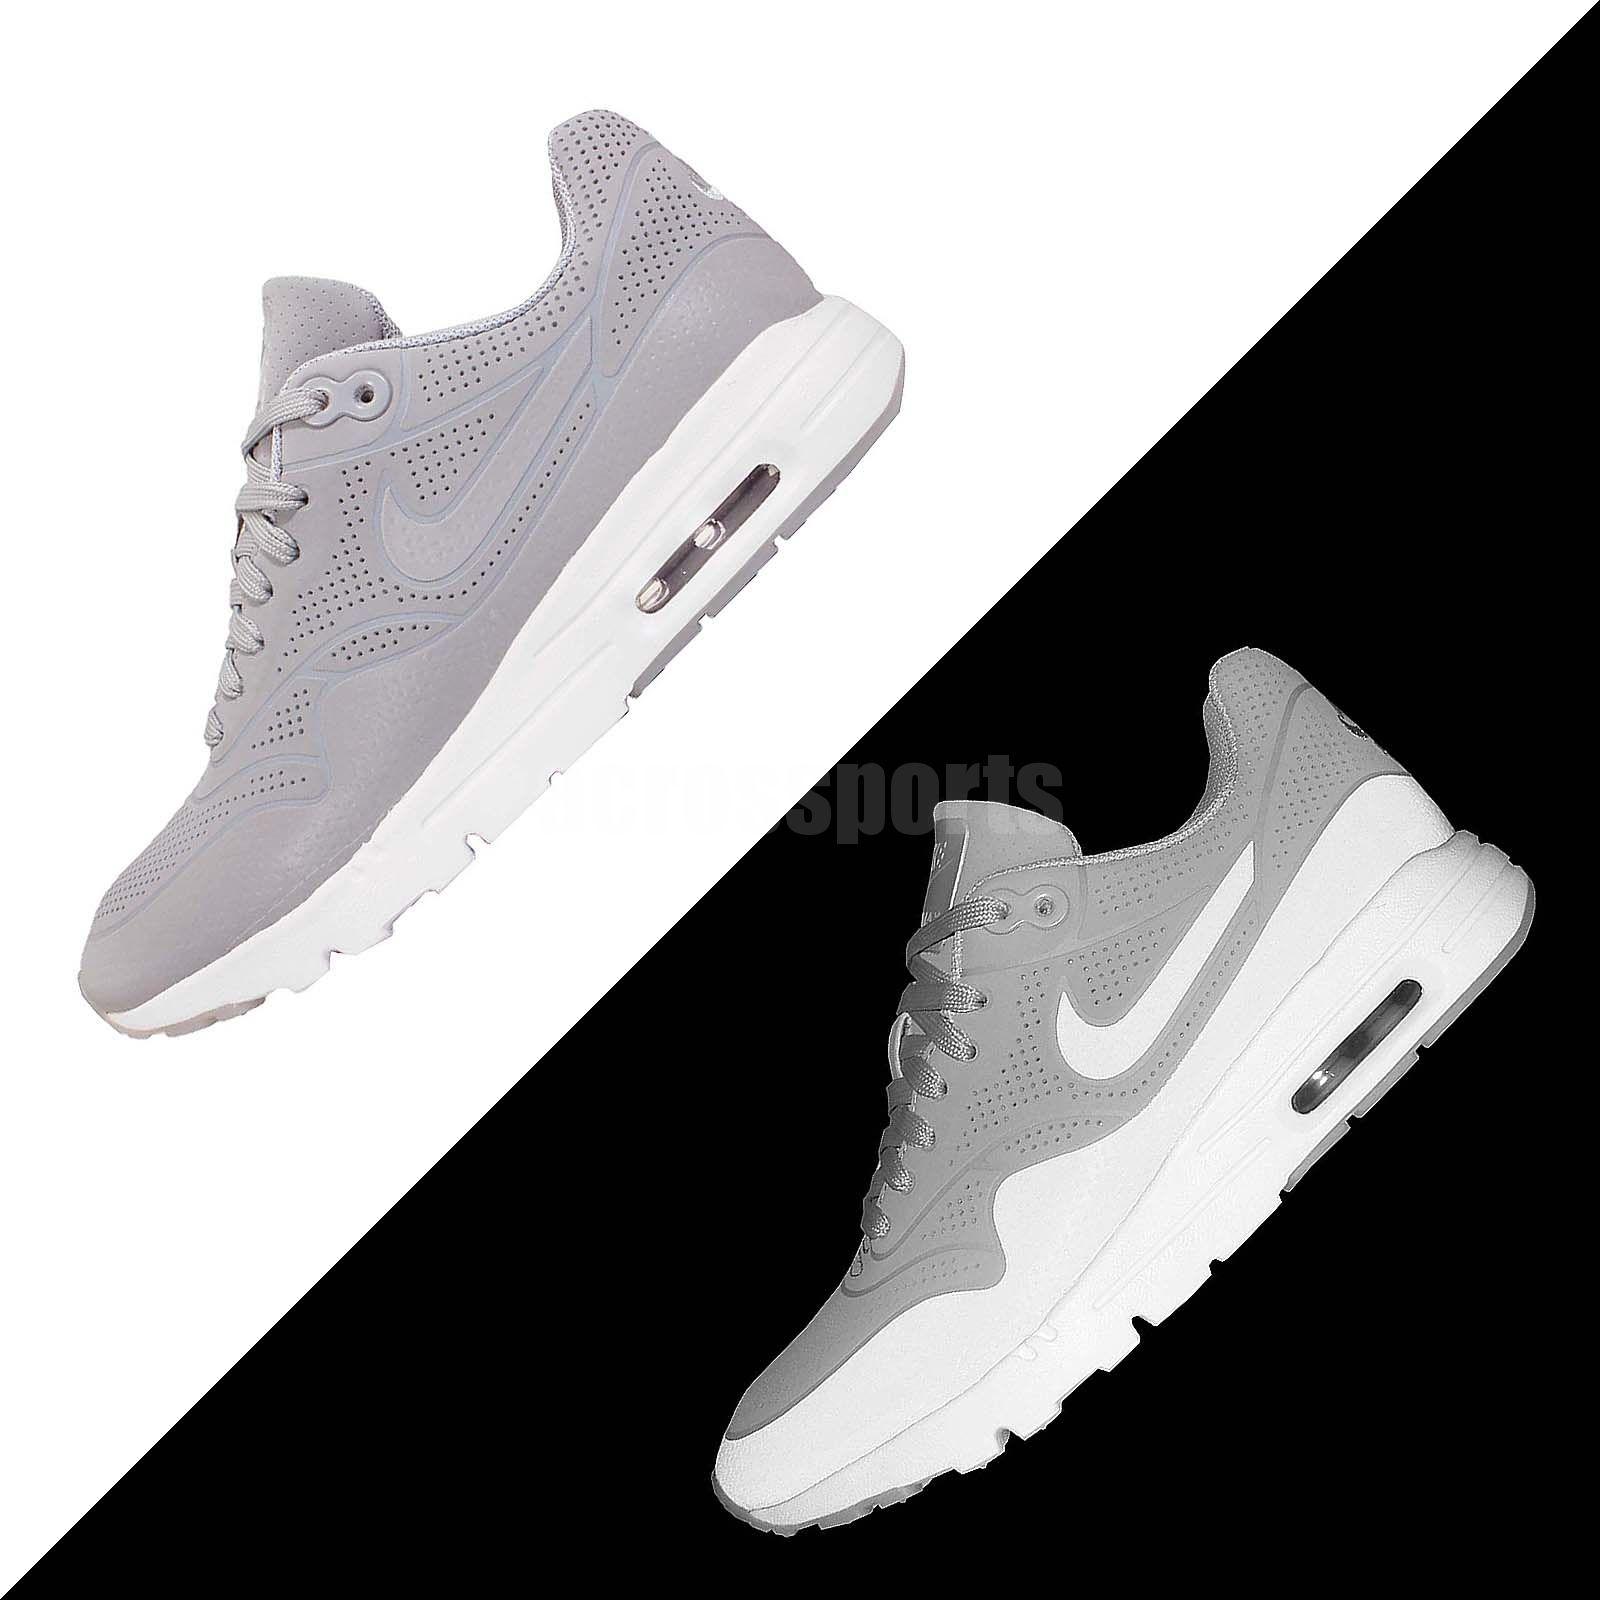 Wmns Nike Air Max 1 Ultra Moire Grey White Womens Running Shoes 704995 002 Womens Running Shoes Nike Air Max Nike